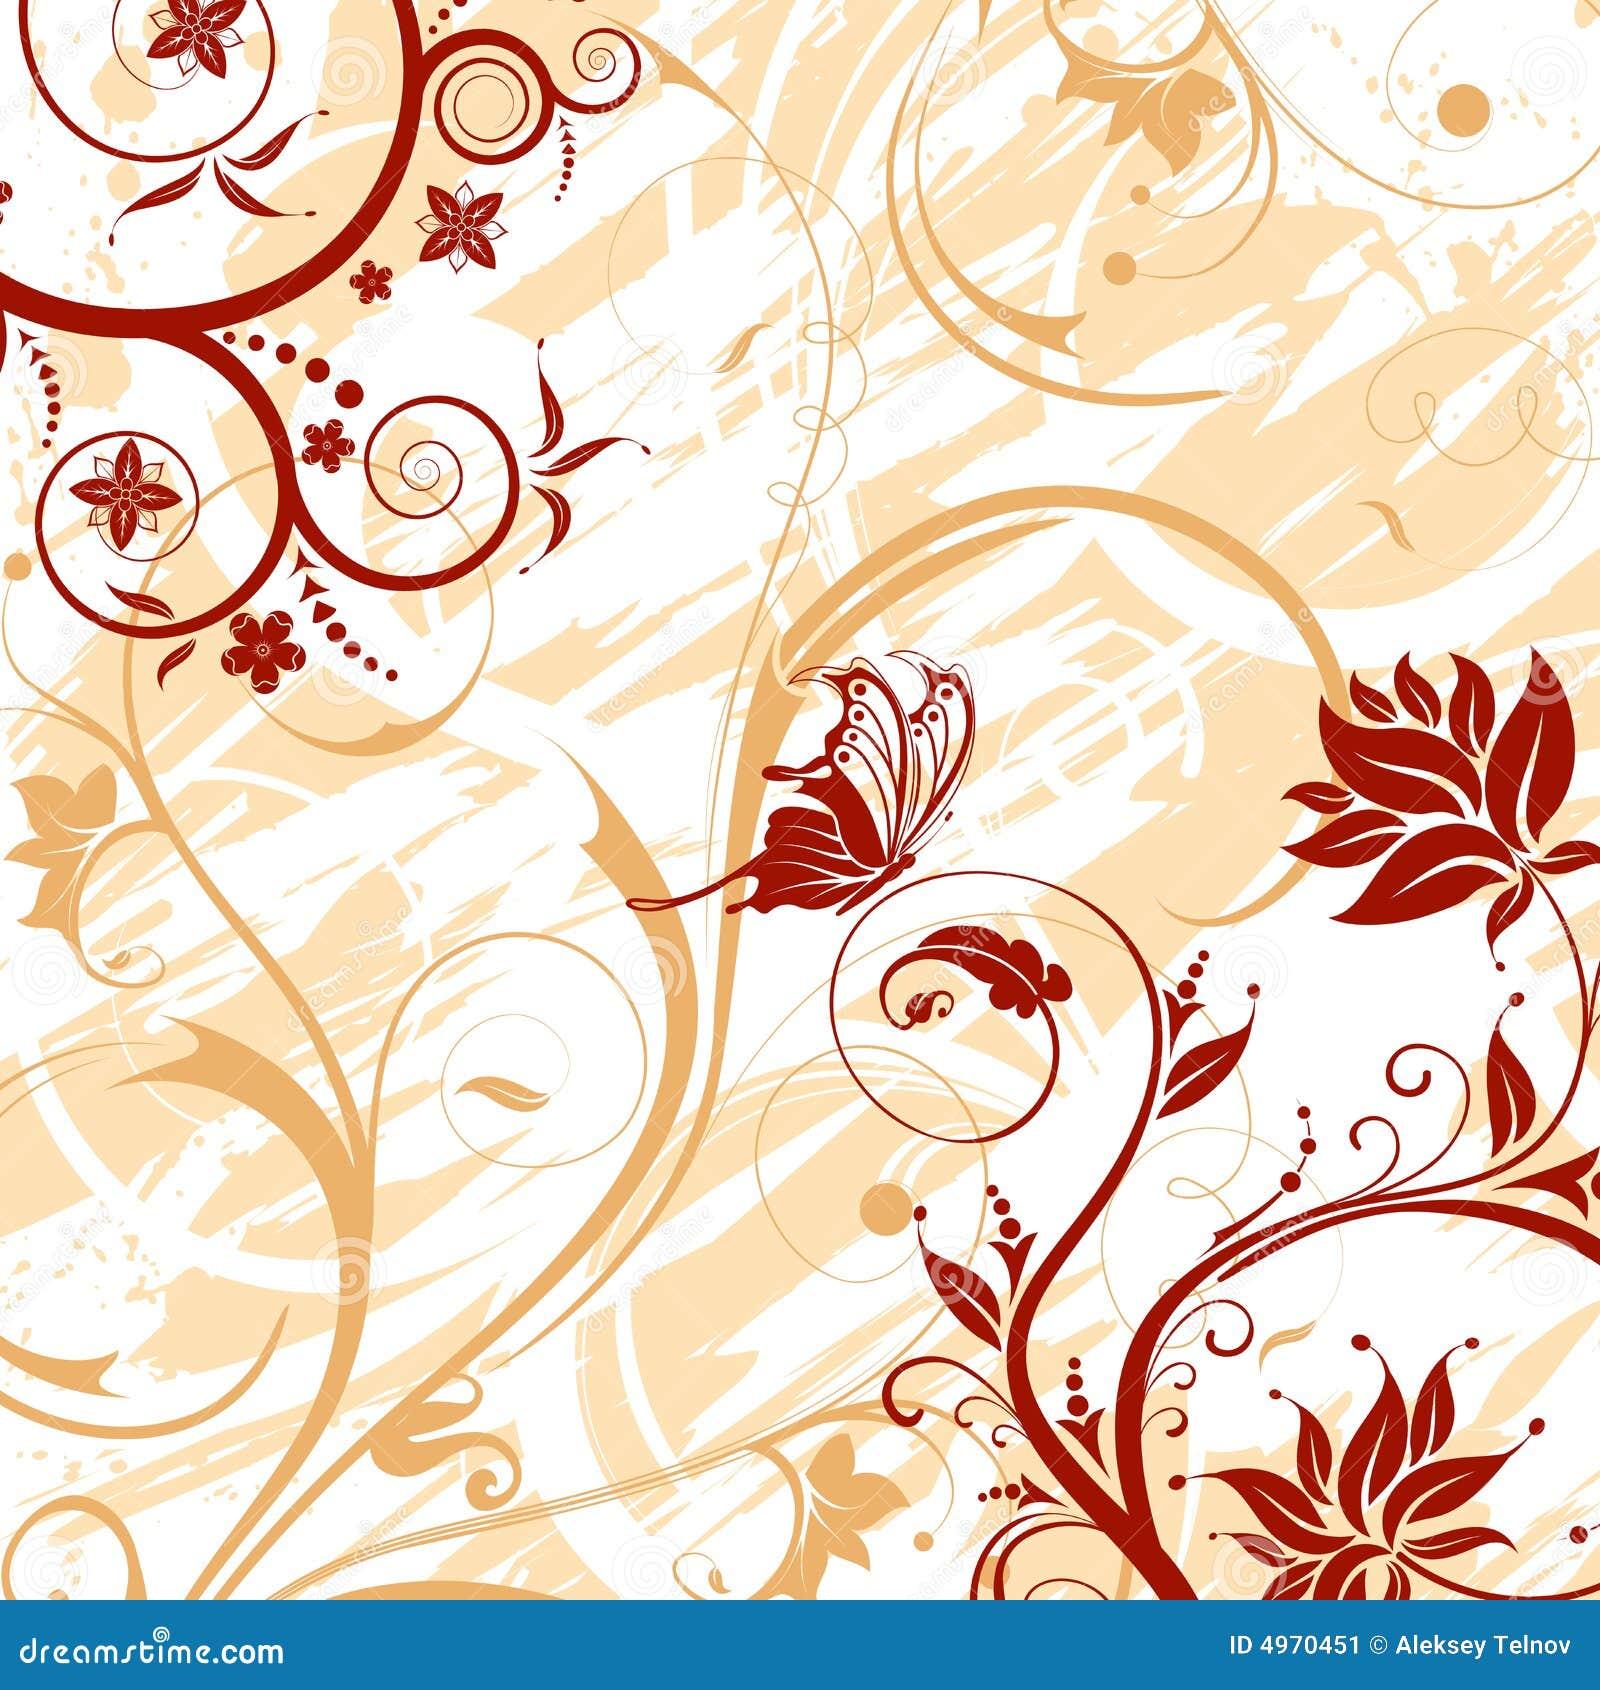 Grunge flower background stock vector. Illustration of ...